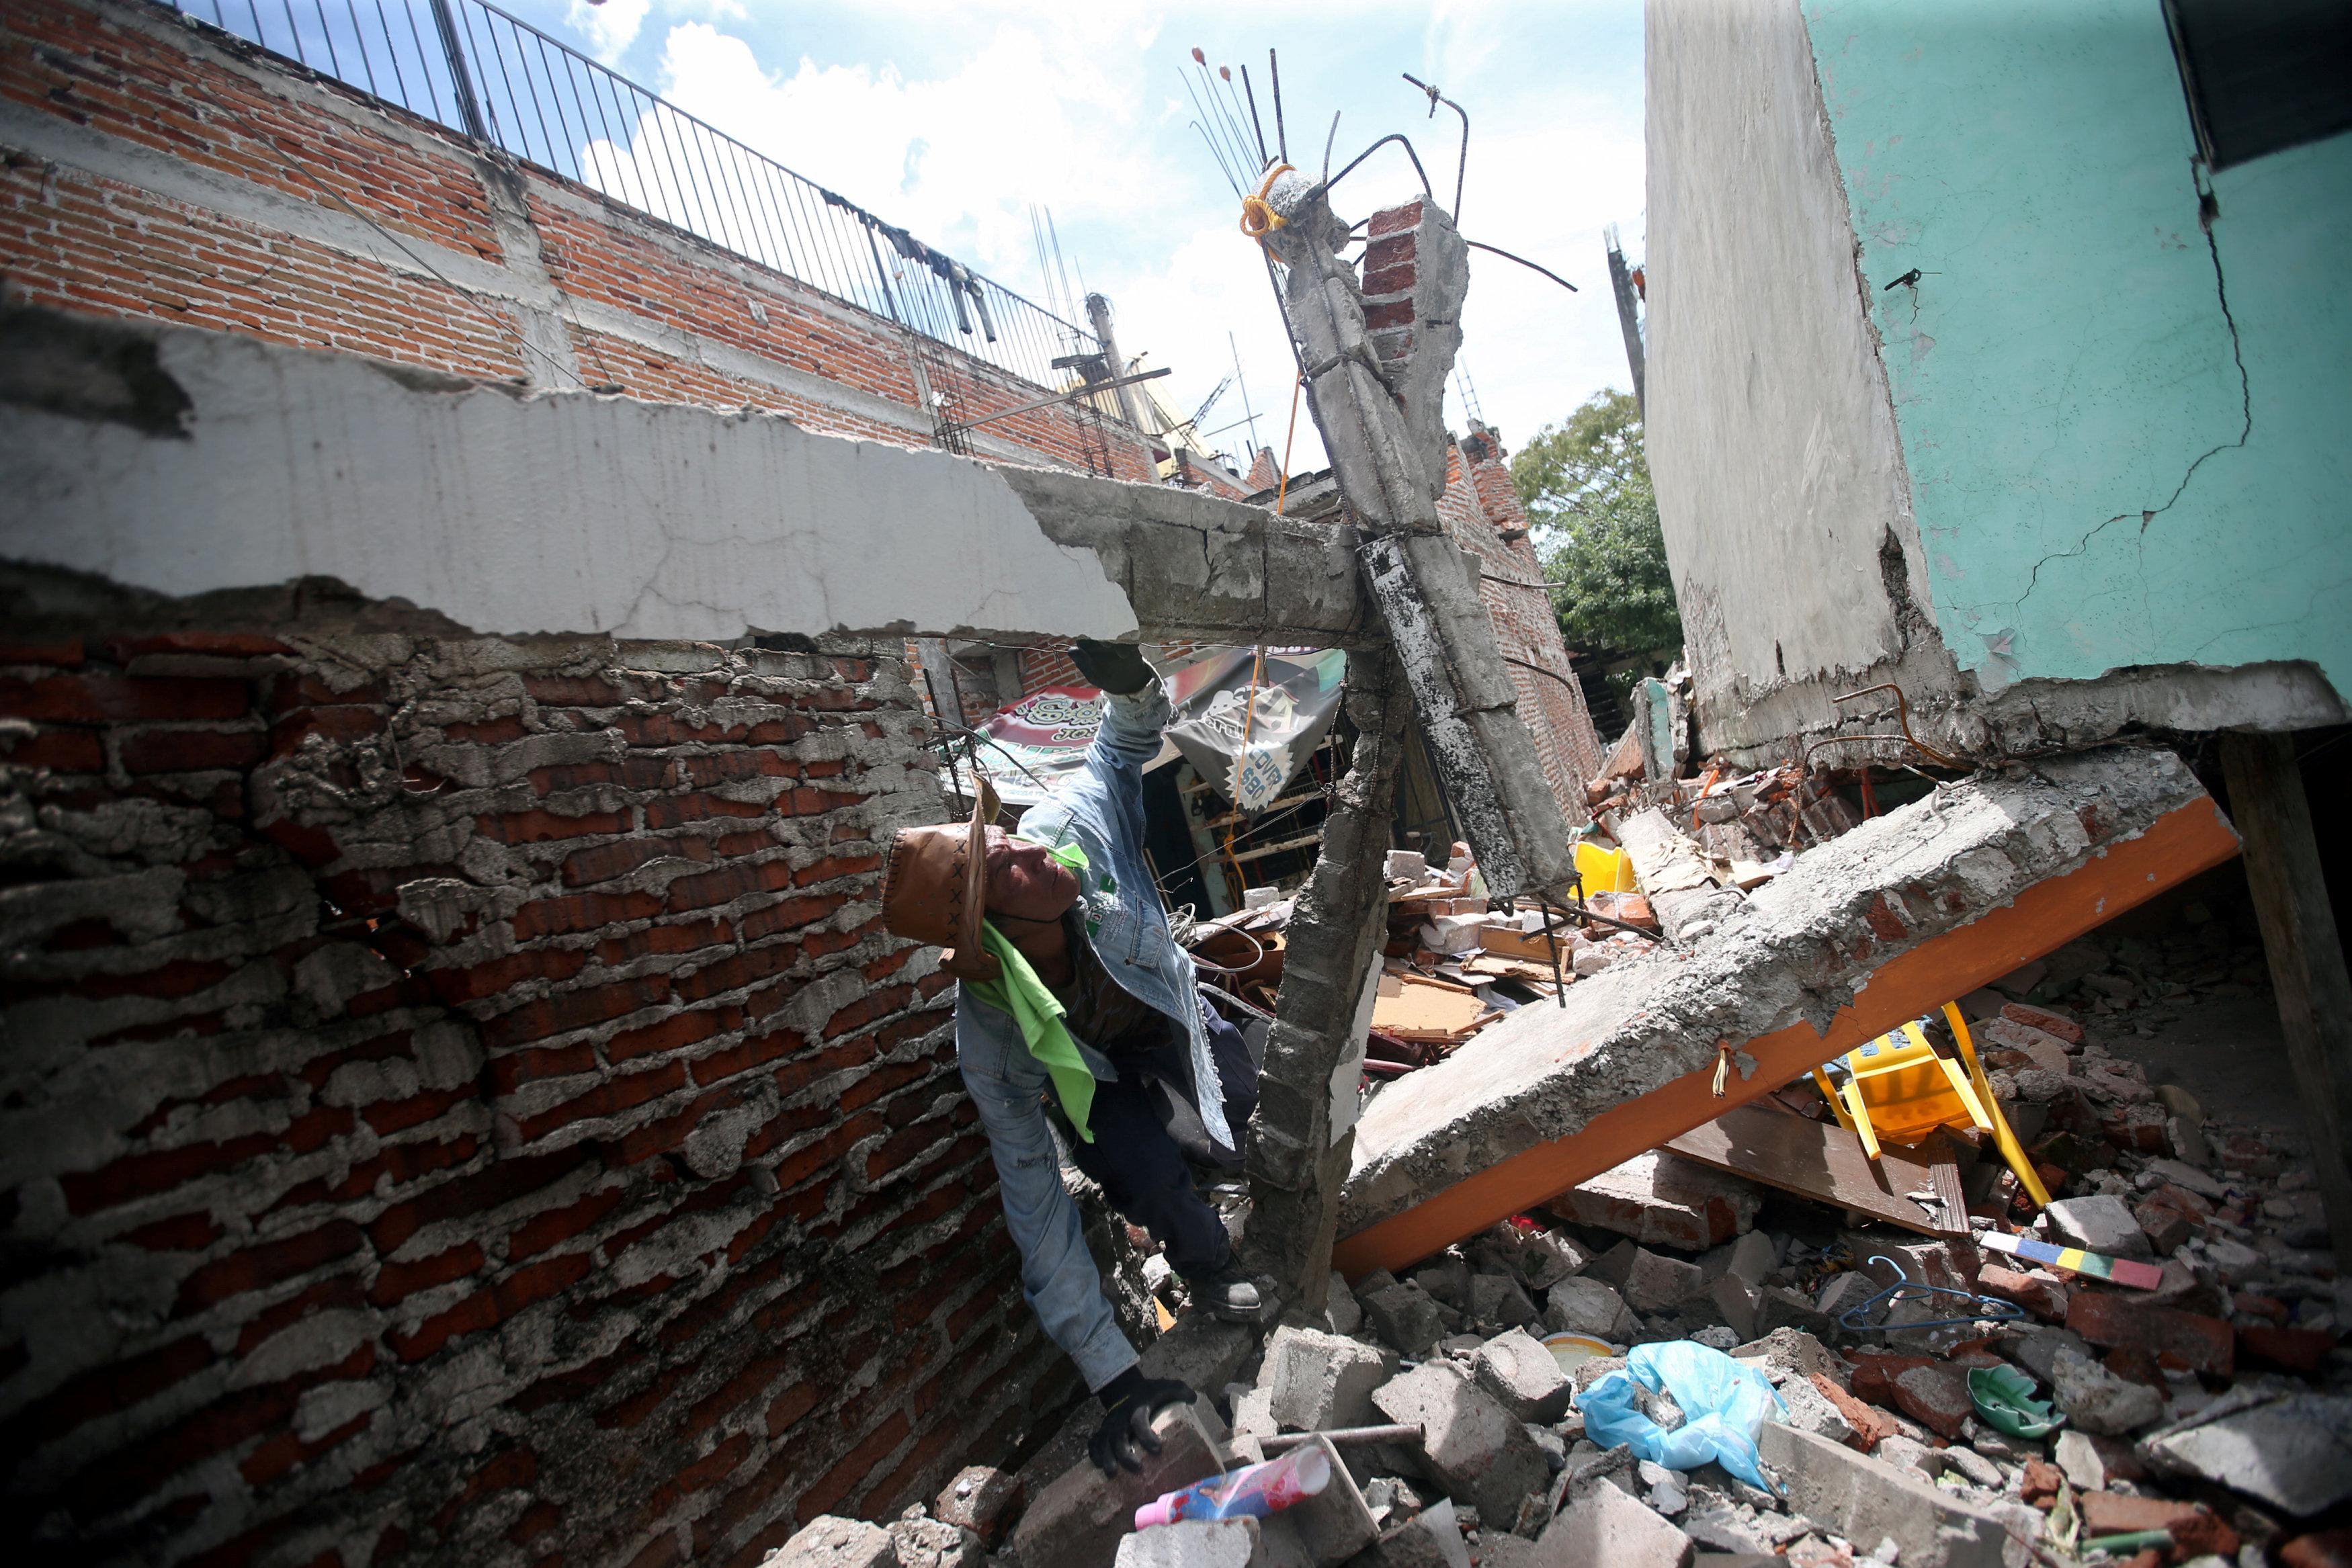 A man looks at the remains of his home after an earthquake in Jojutla de Juarez, Mexico September 21, 2017. REUTERS/Edgard Garrido